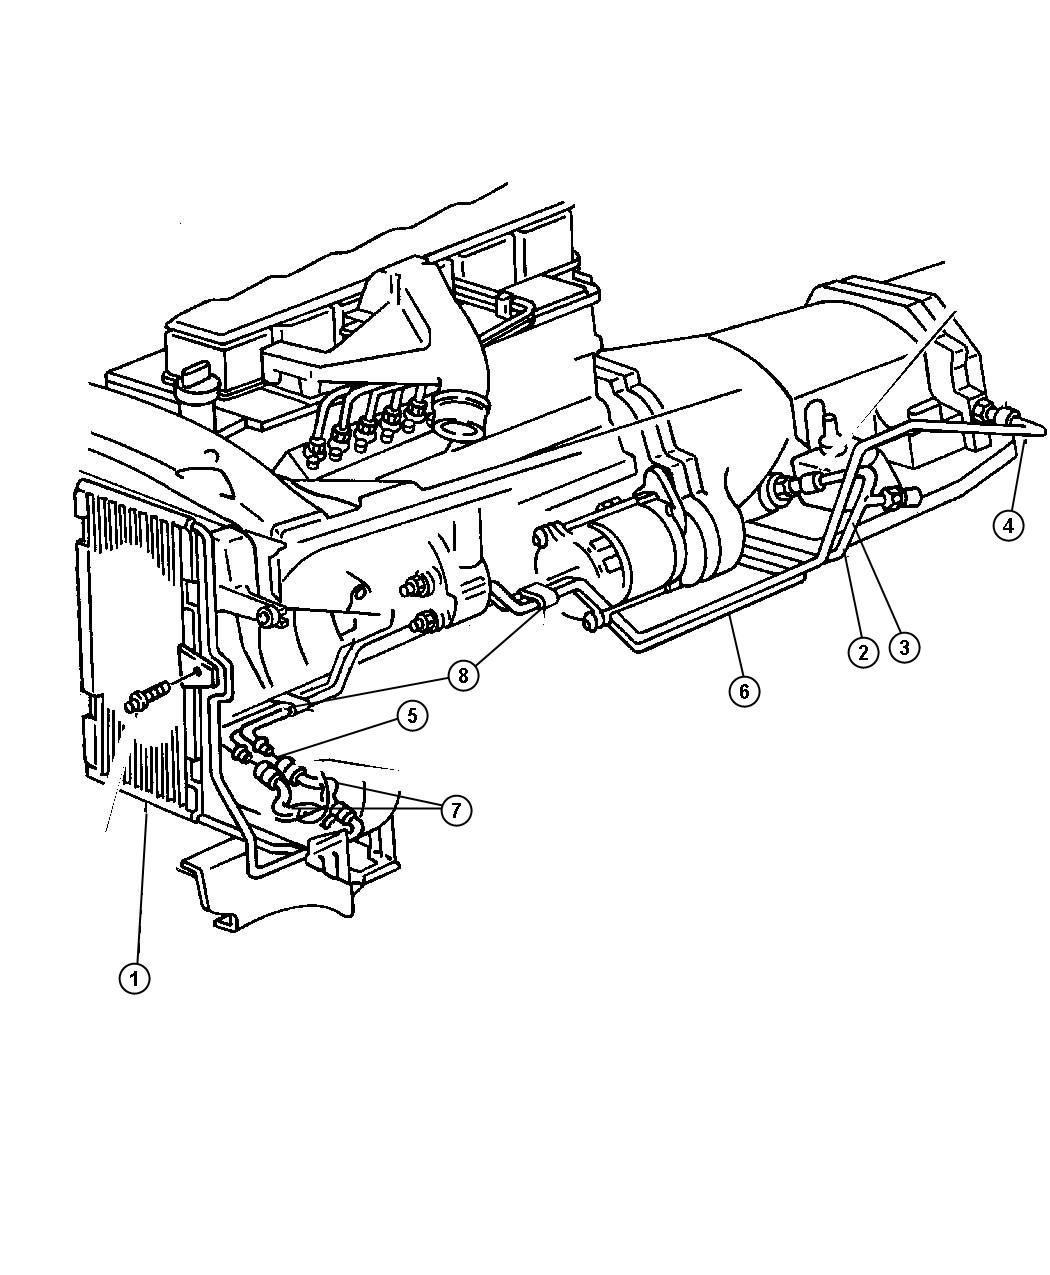 Dodge Ram Used For Tube And Hose Oil Cooler Return